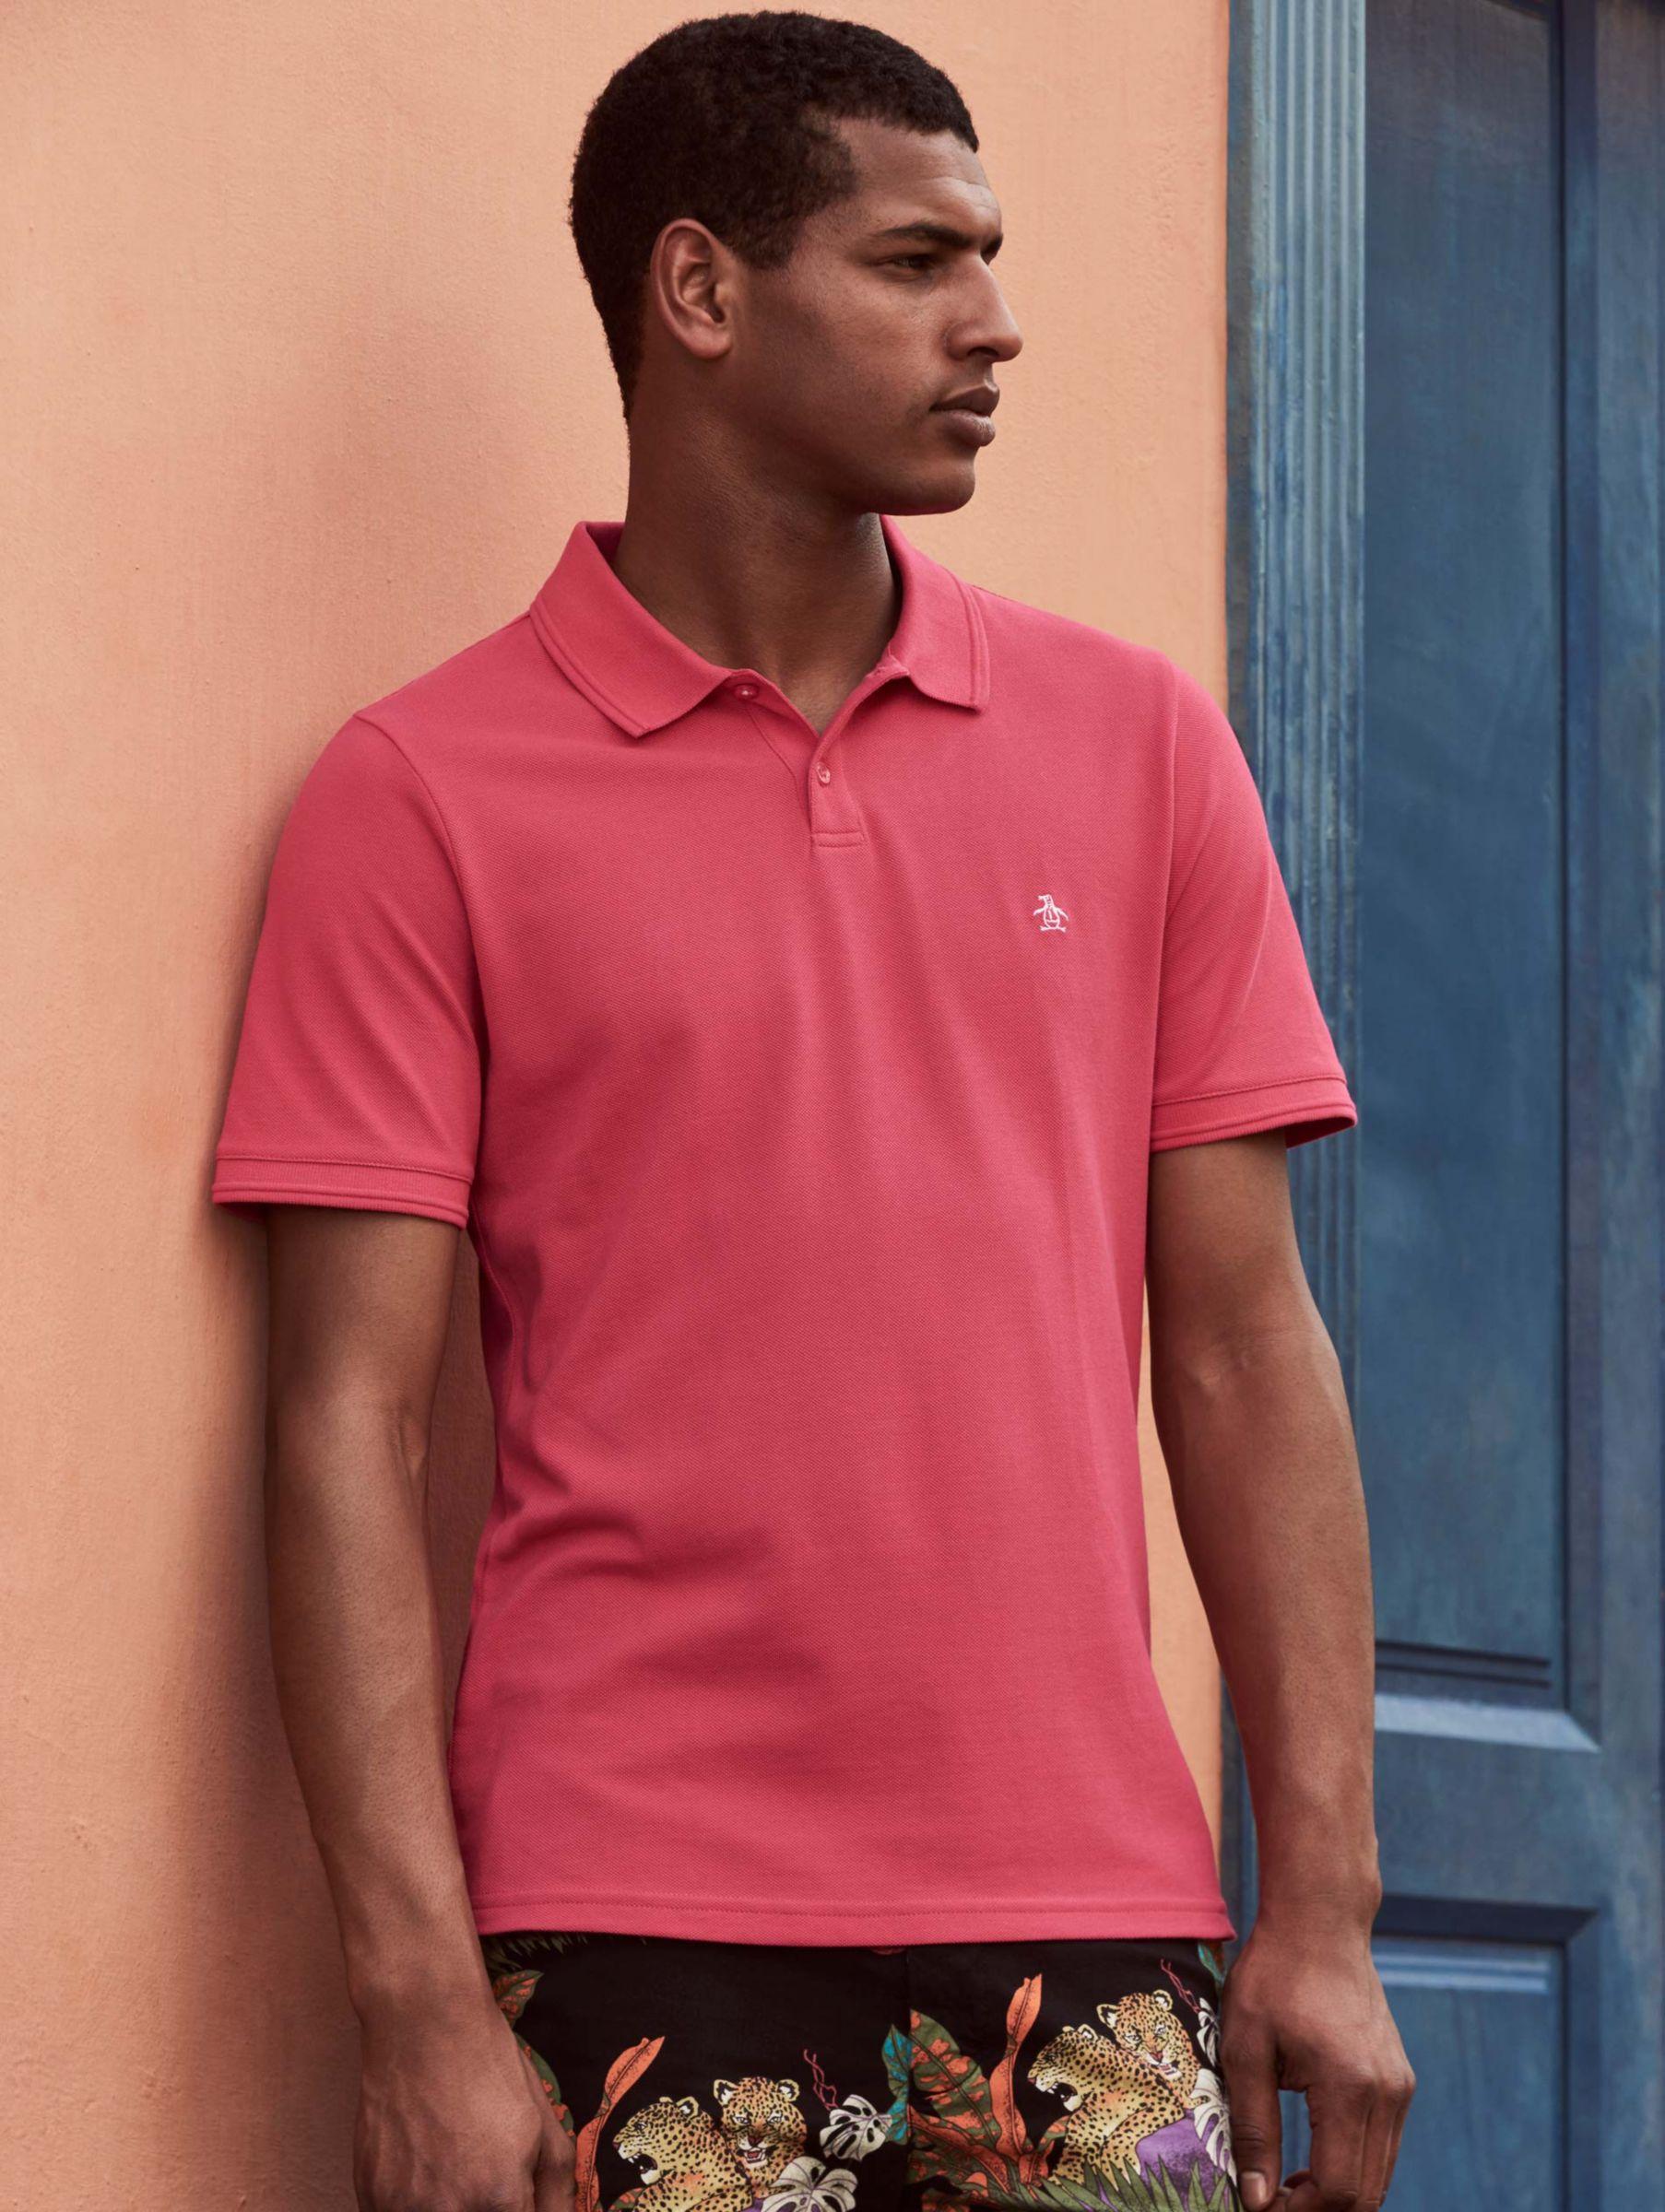 82fdae6fd09 Shop T-Shirts · POLO SHIRTS